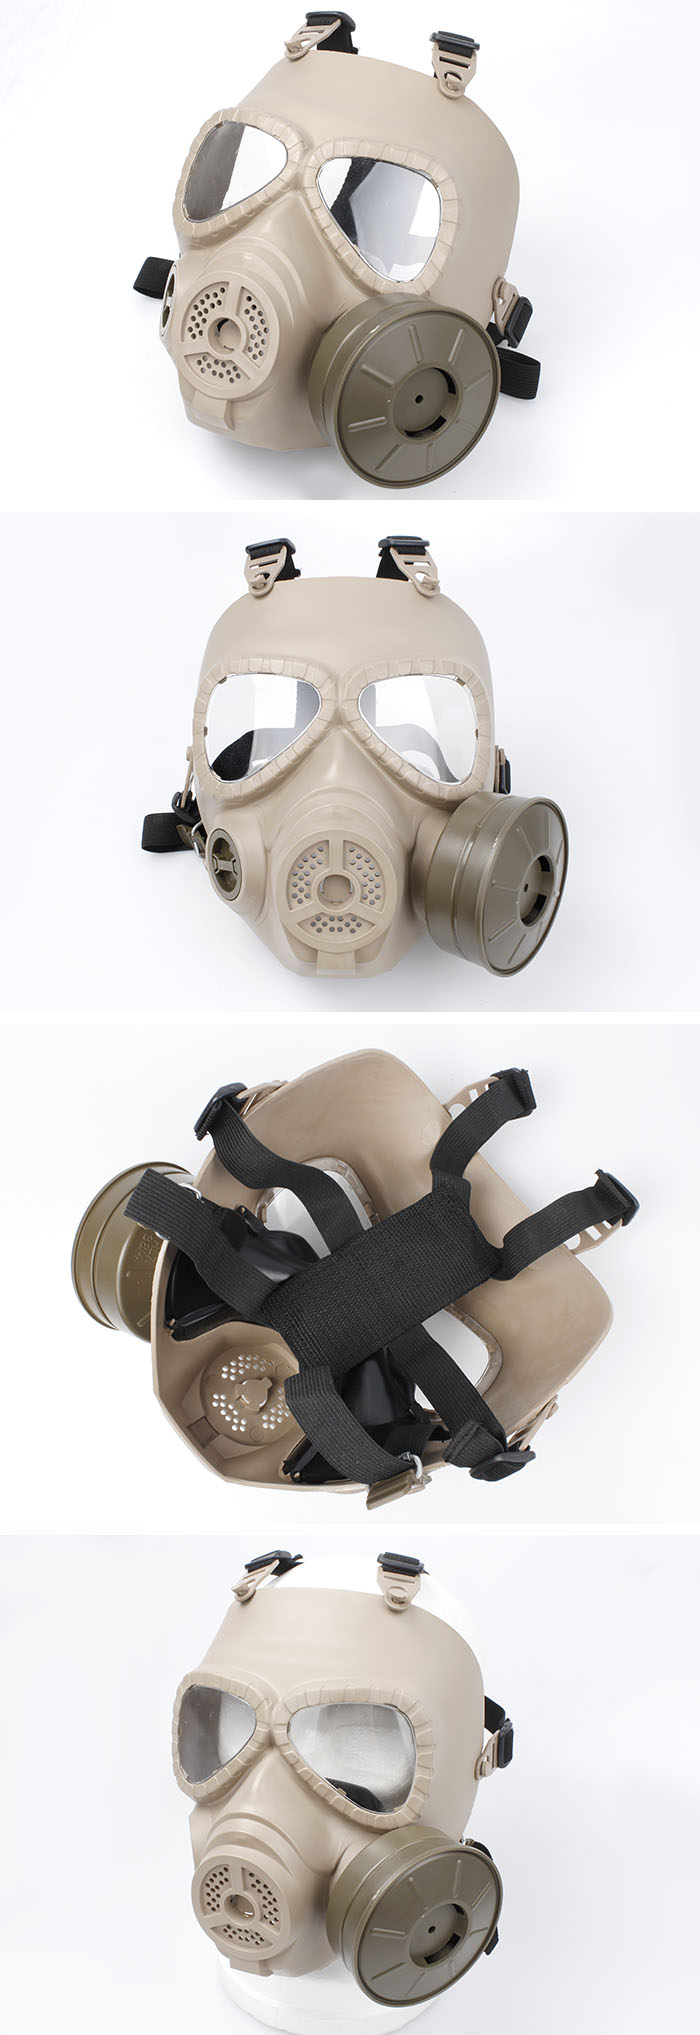 masque gaz avec ventilateur g cm toxic mask style fan airsoft mask page 2. Black Bedroom Furniture Sets. Home Design Ideas